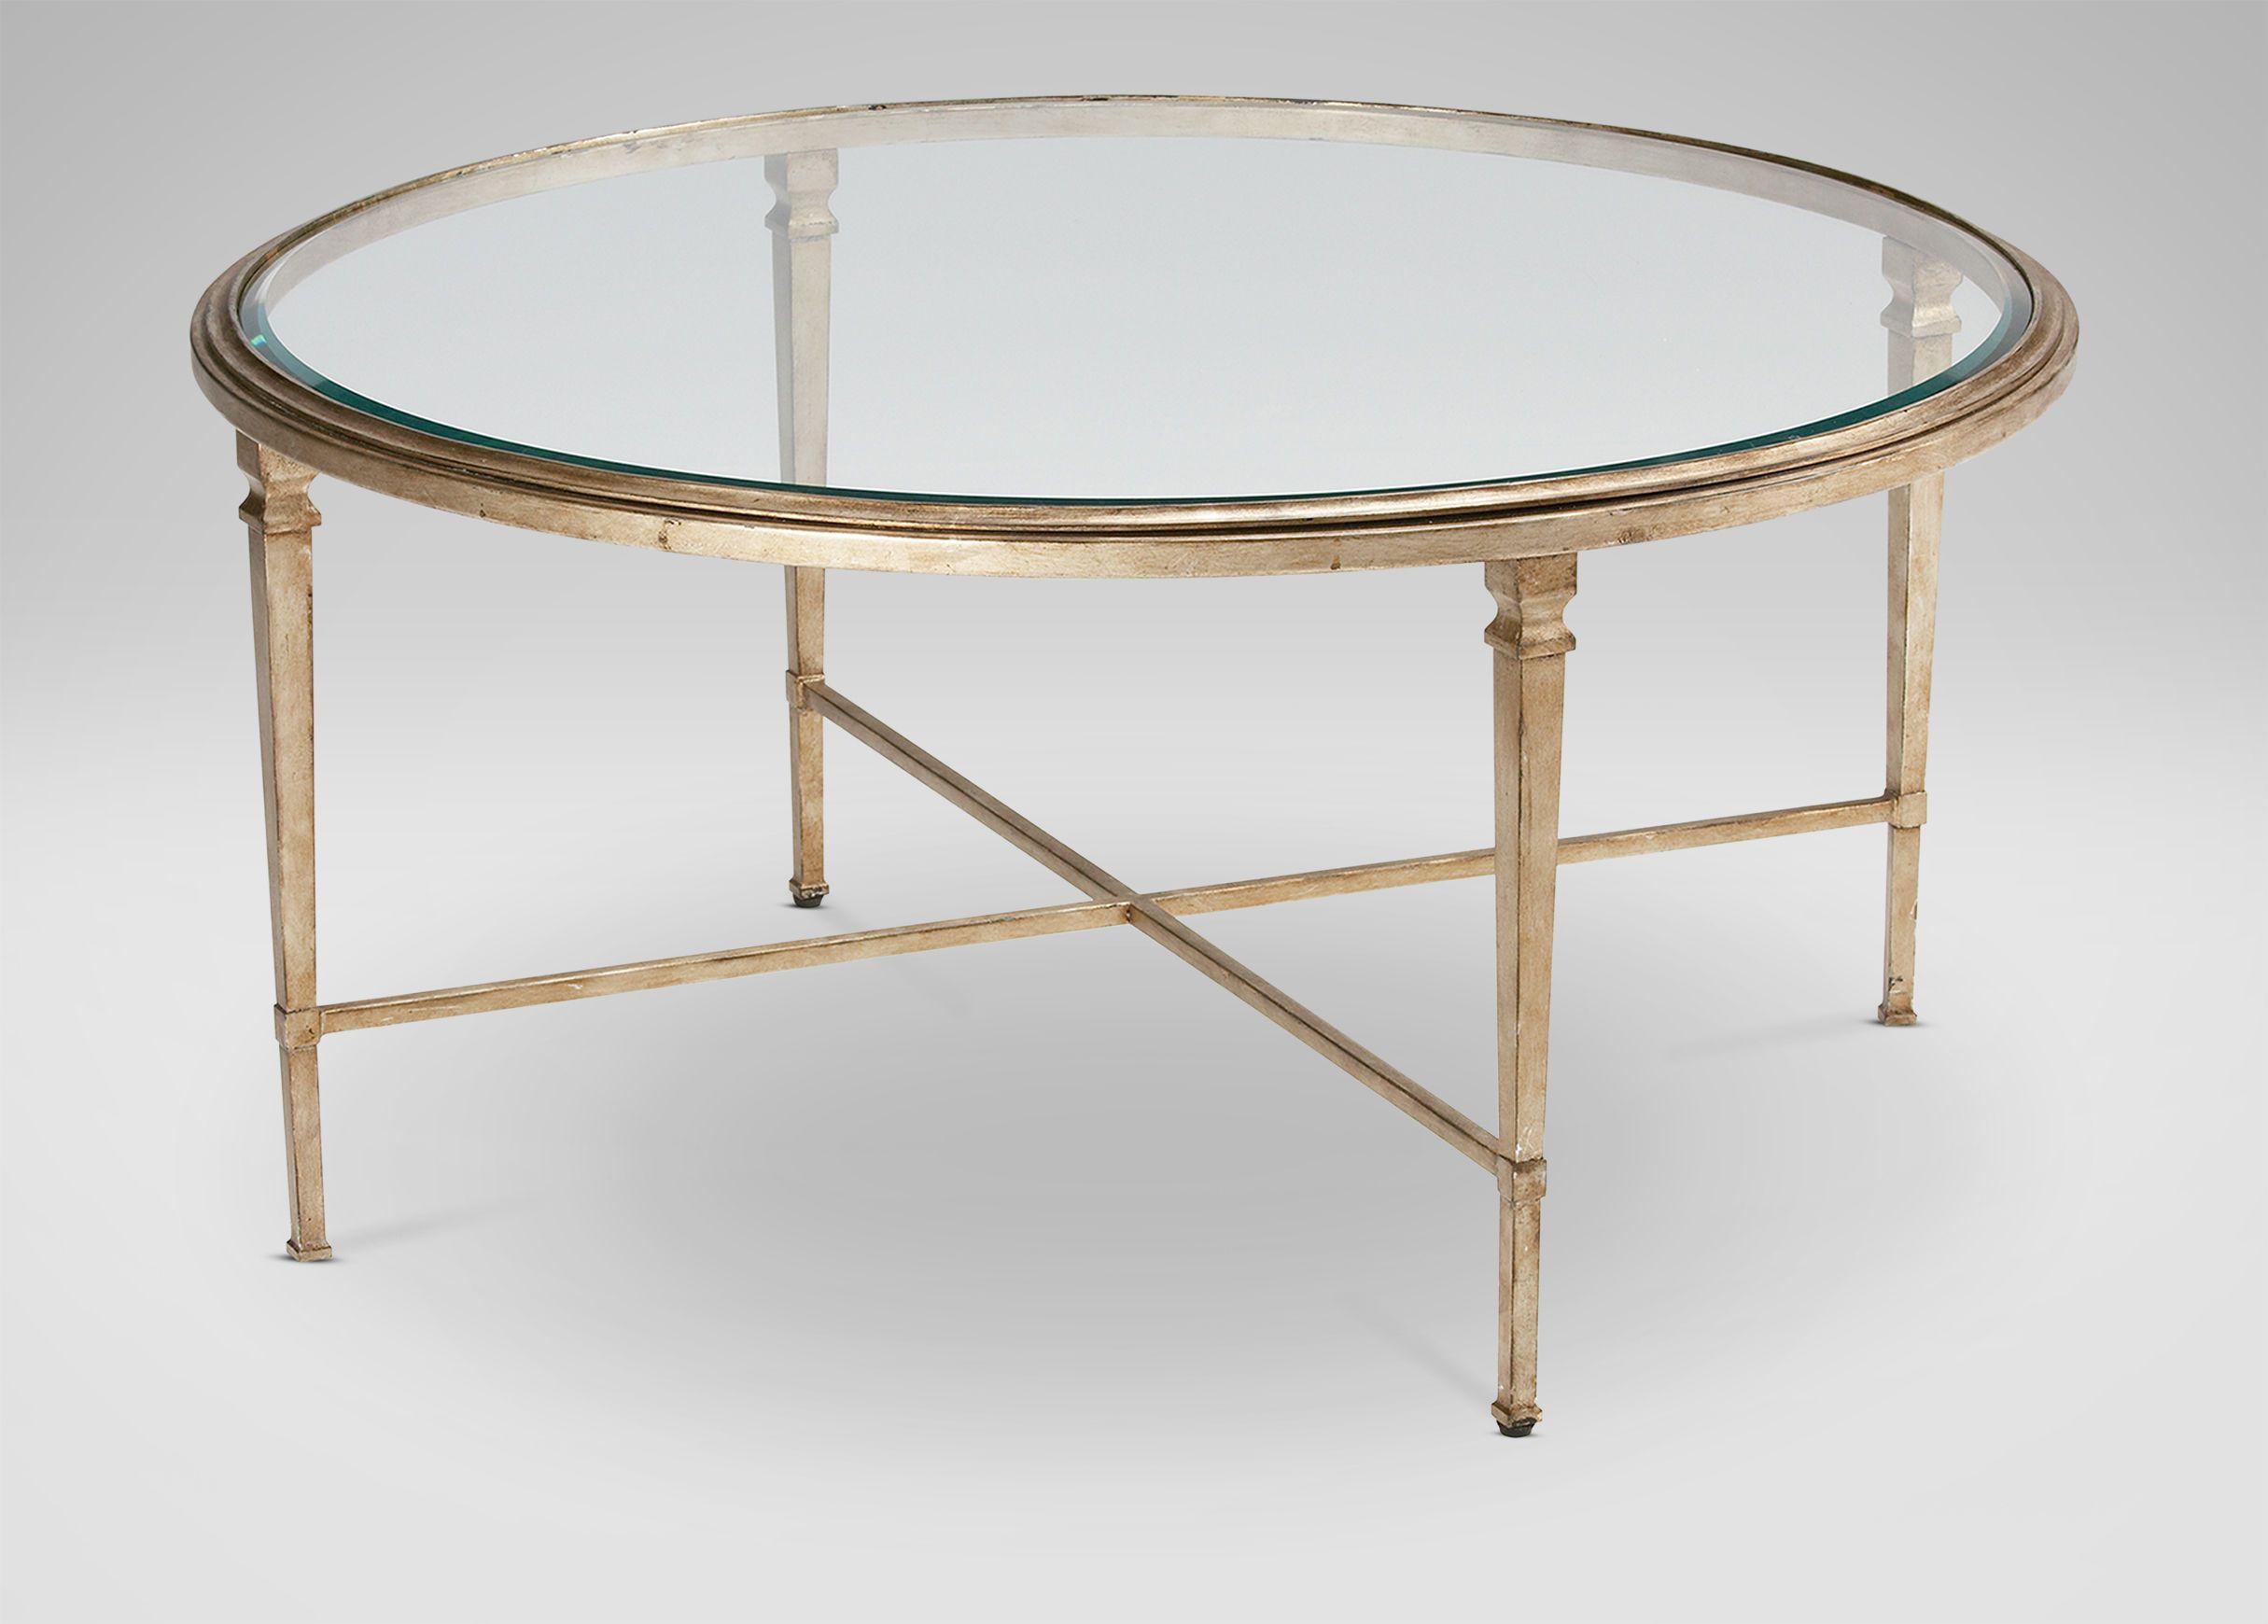 Heron Round Coffee Table Coffee Tables Coffee Table Small Coffee Table Round Coffee Table [ 1740 x 2430 Pixel ]